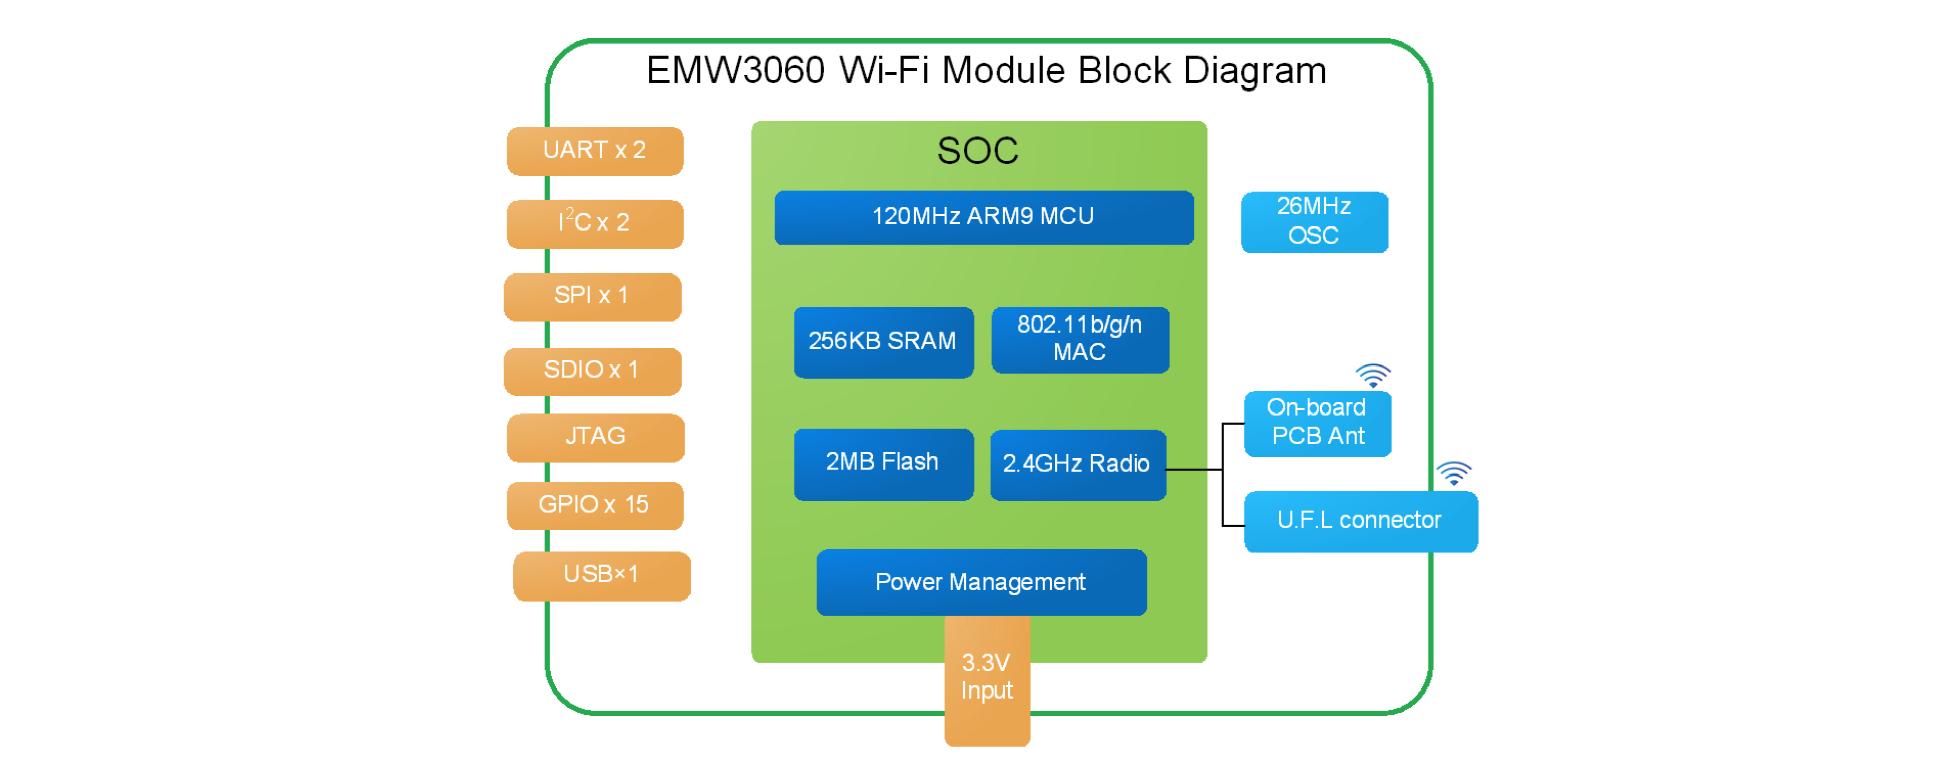 EMW3060 block